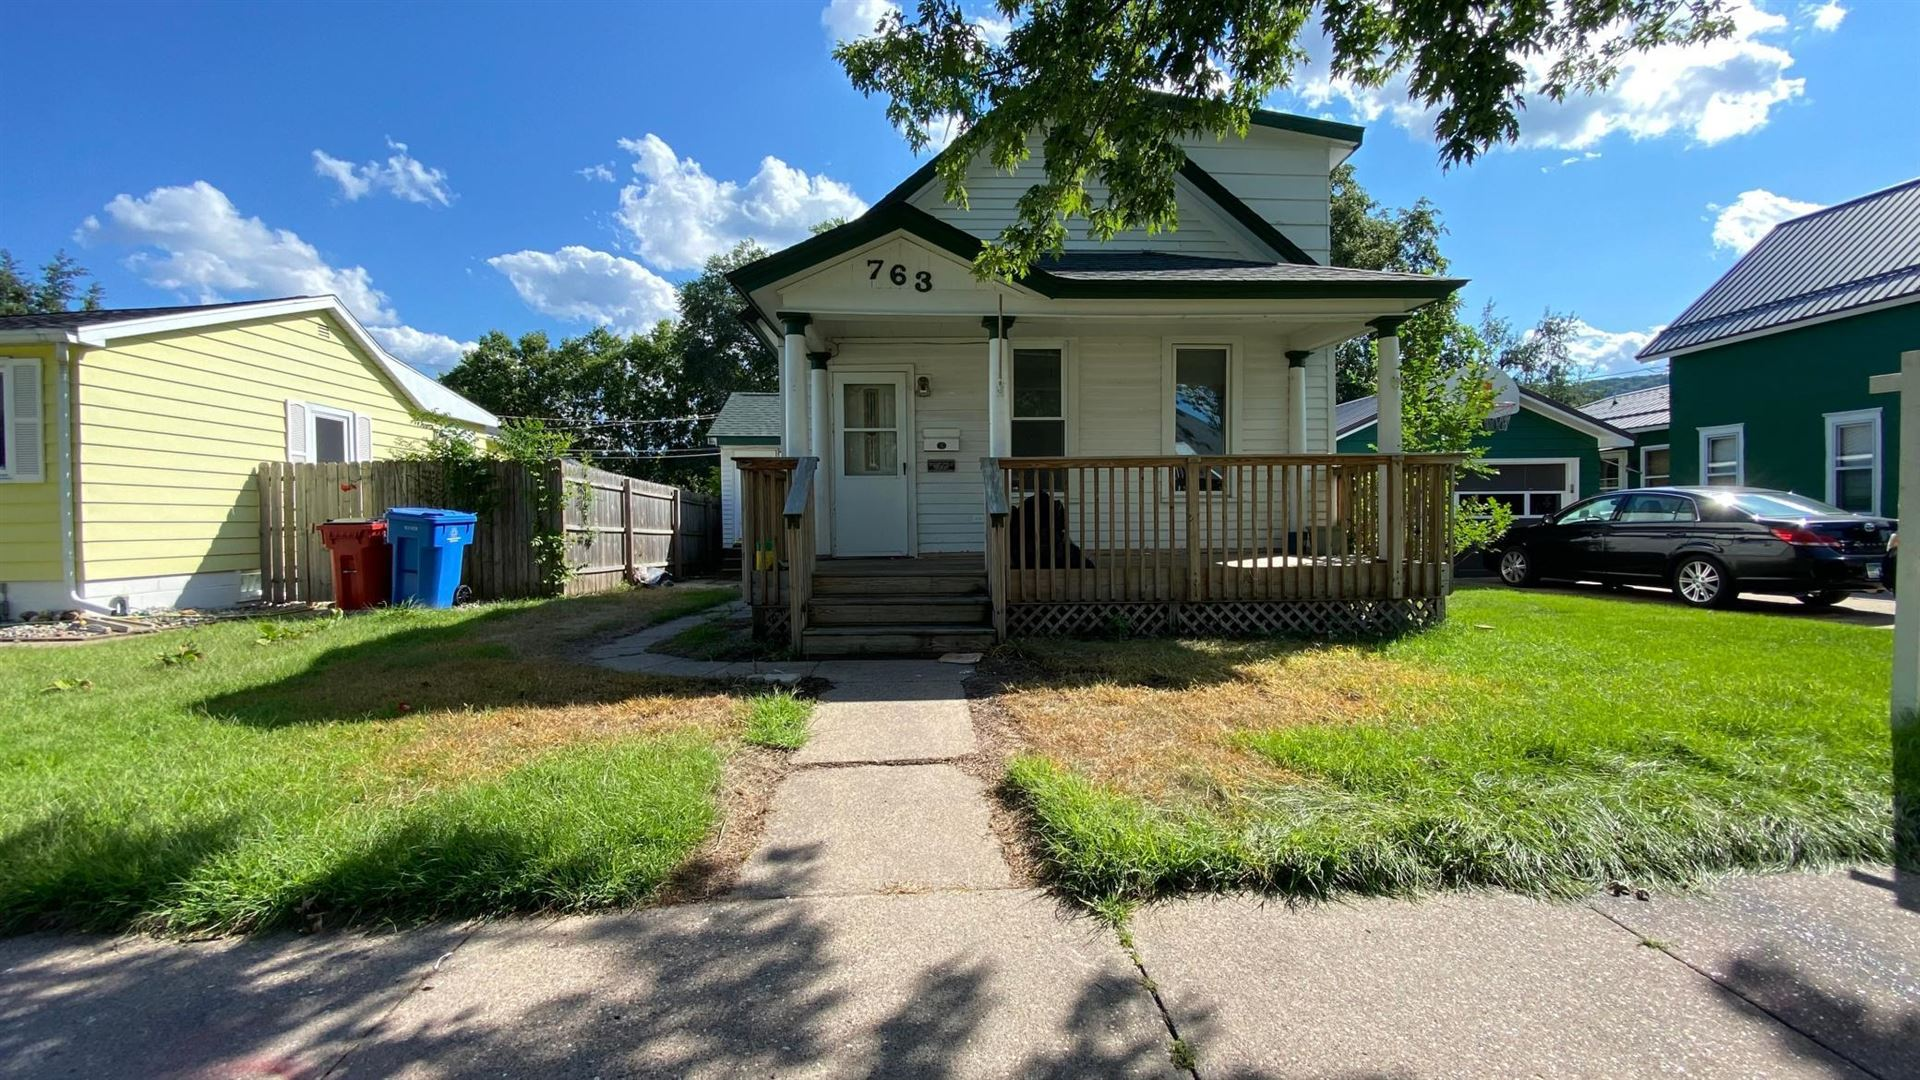 763 W Mark Street, Winona, MN 55987 - MLS#: 6068670